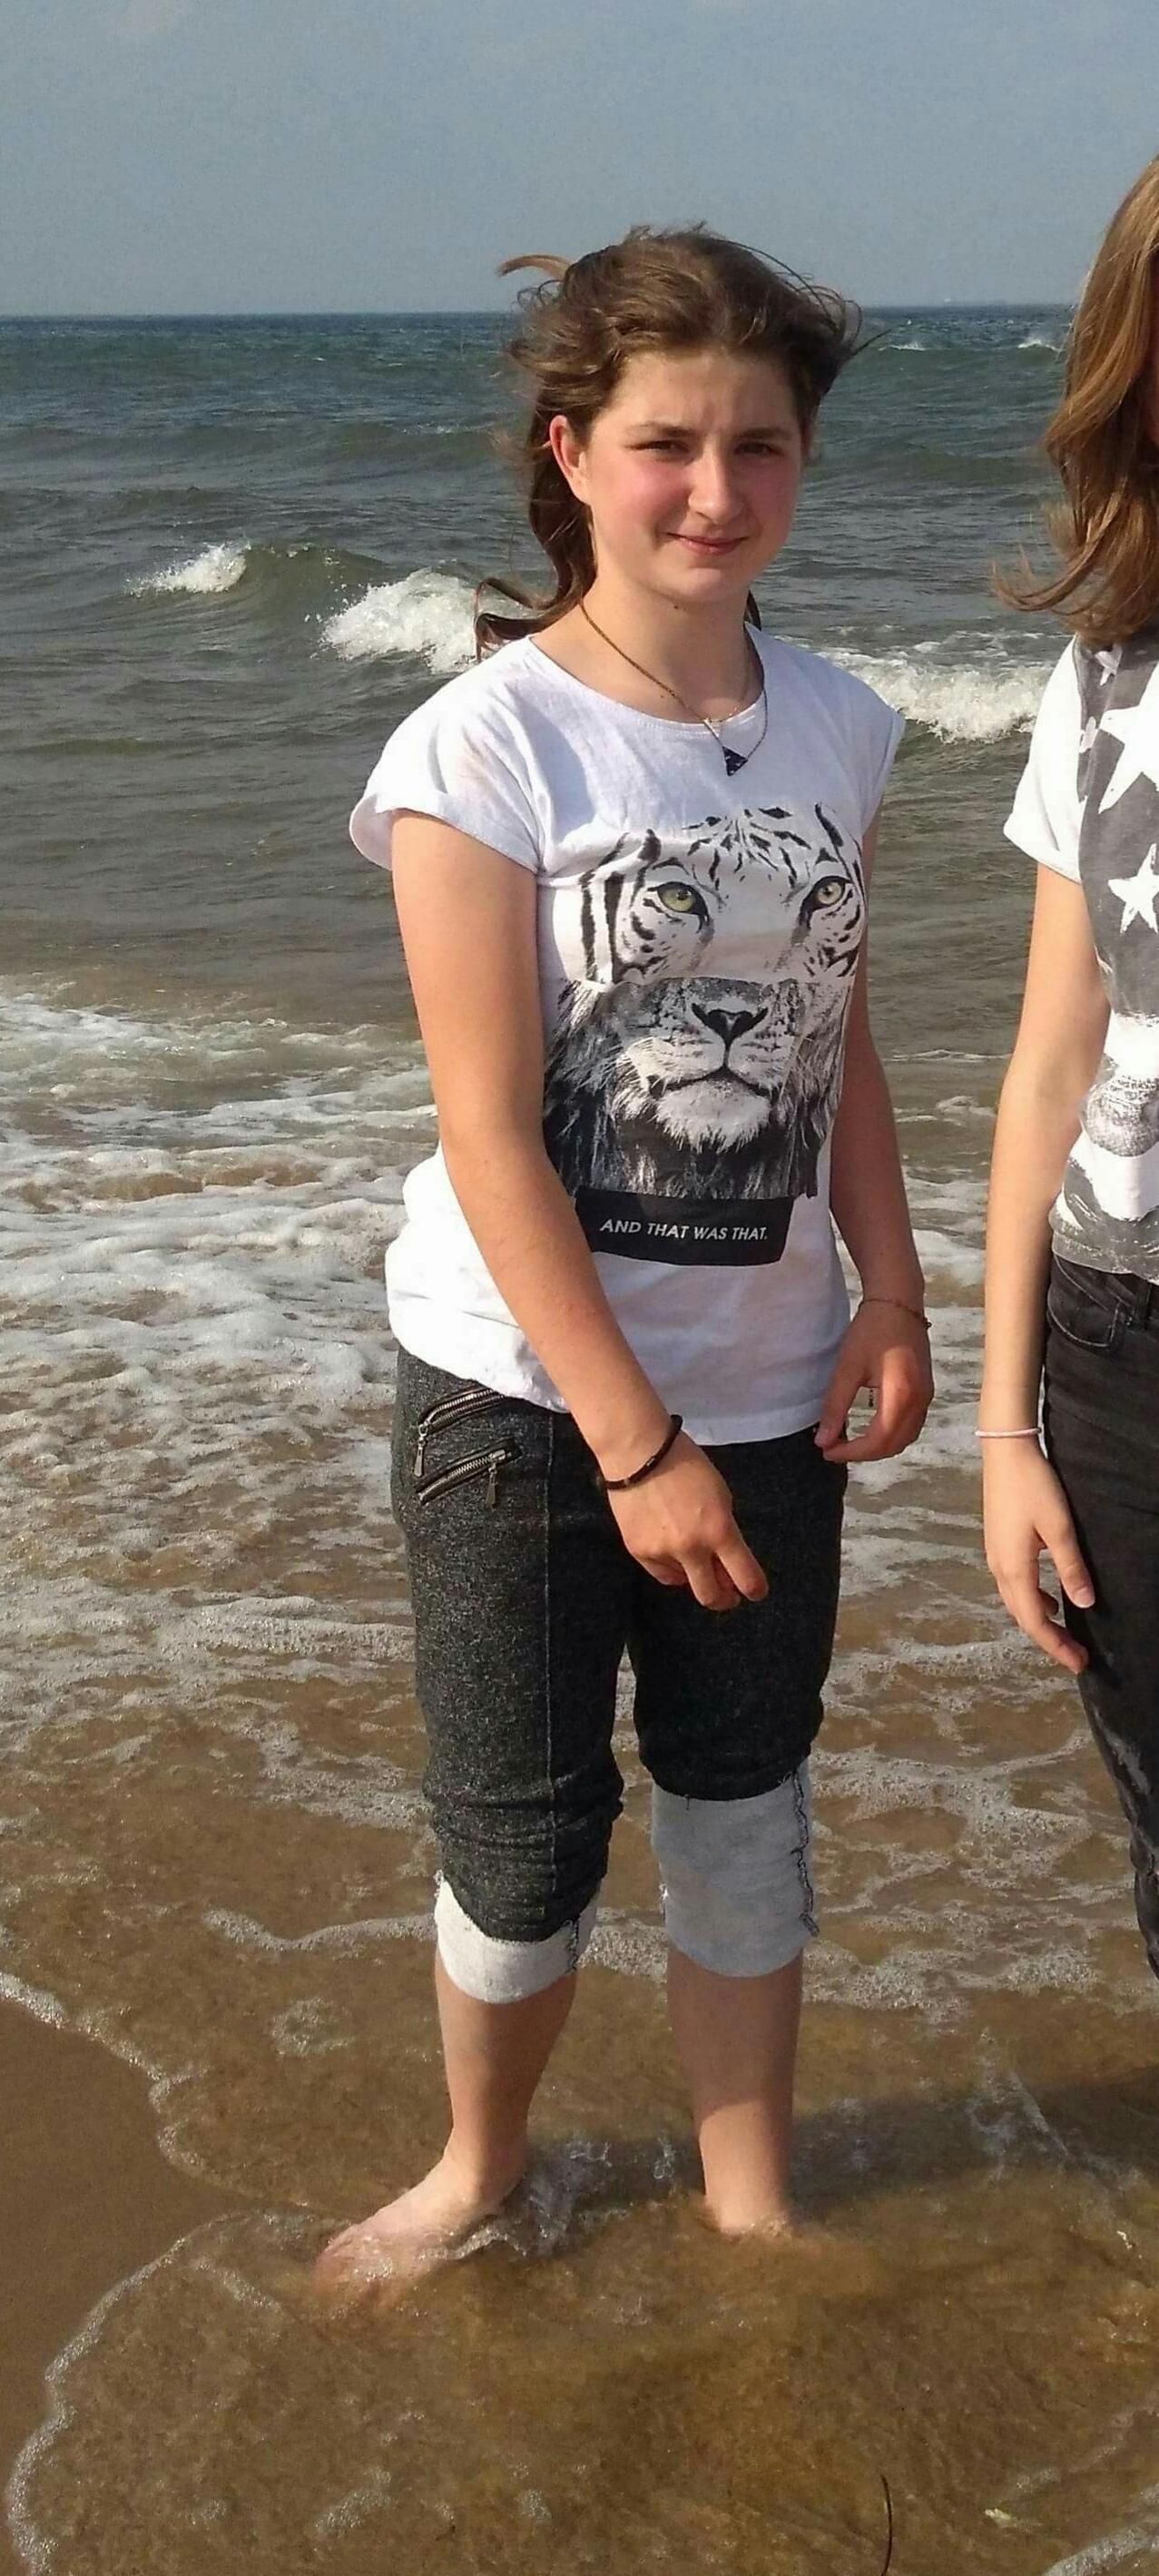 Zaginiona 12-letnia Karolina Wasiluk